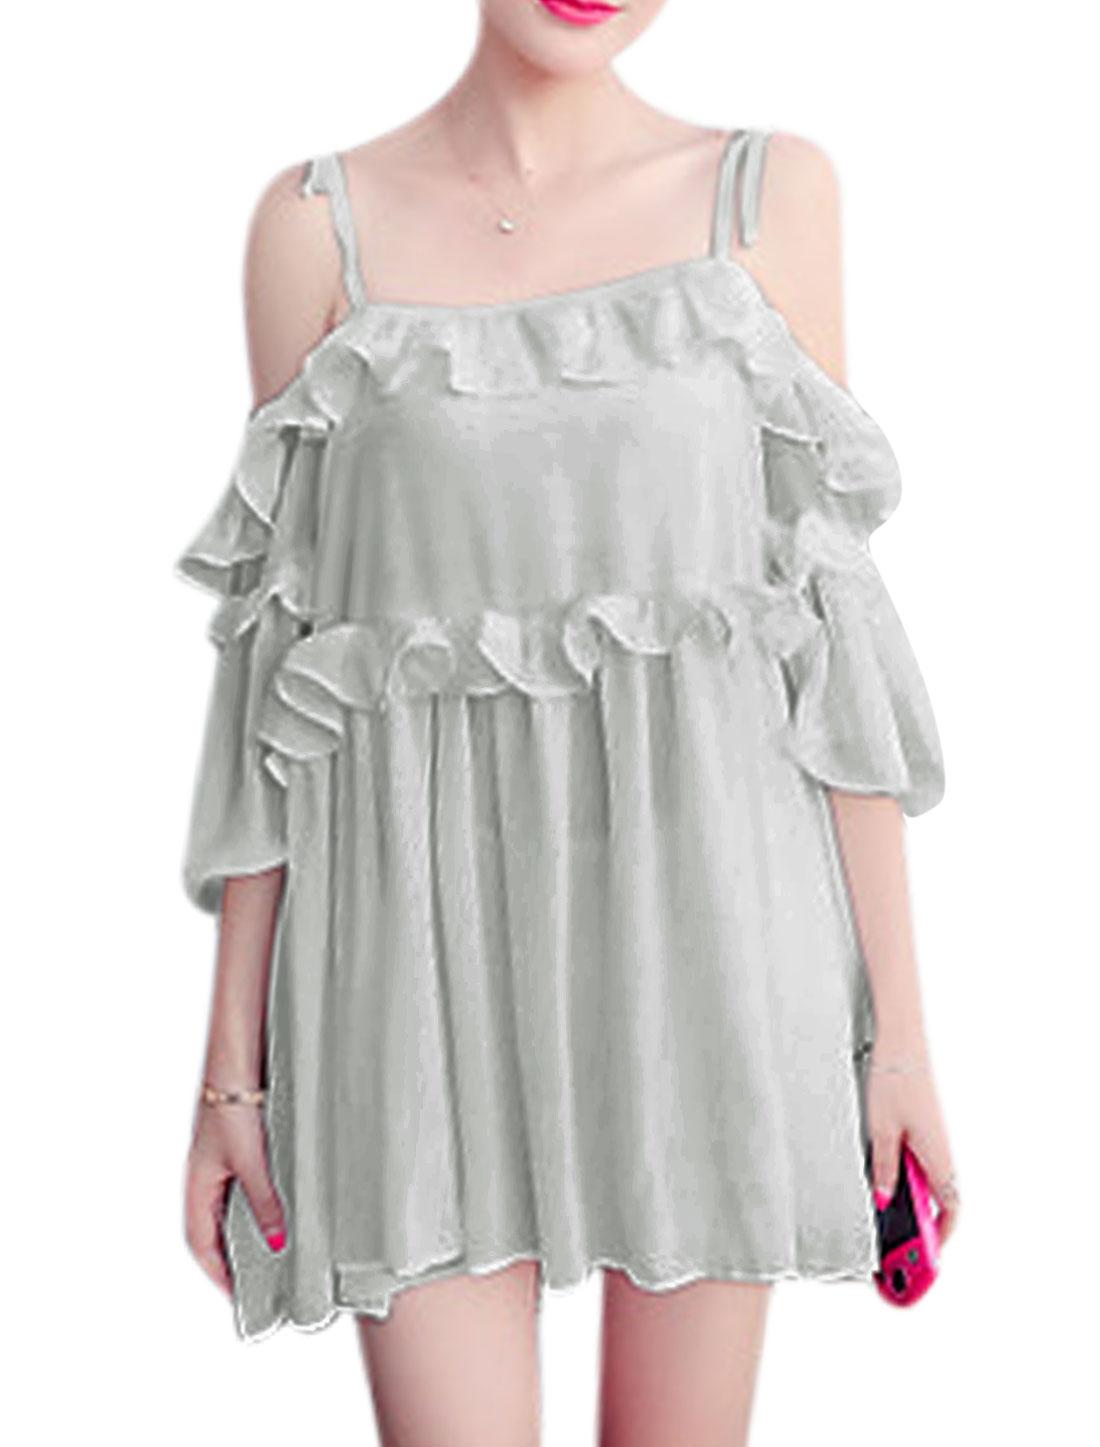 Lady Self Tie Straps 3/4 Sleeves Chiffon Mini Dresses Gray XS